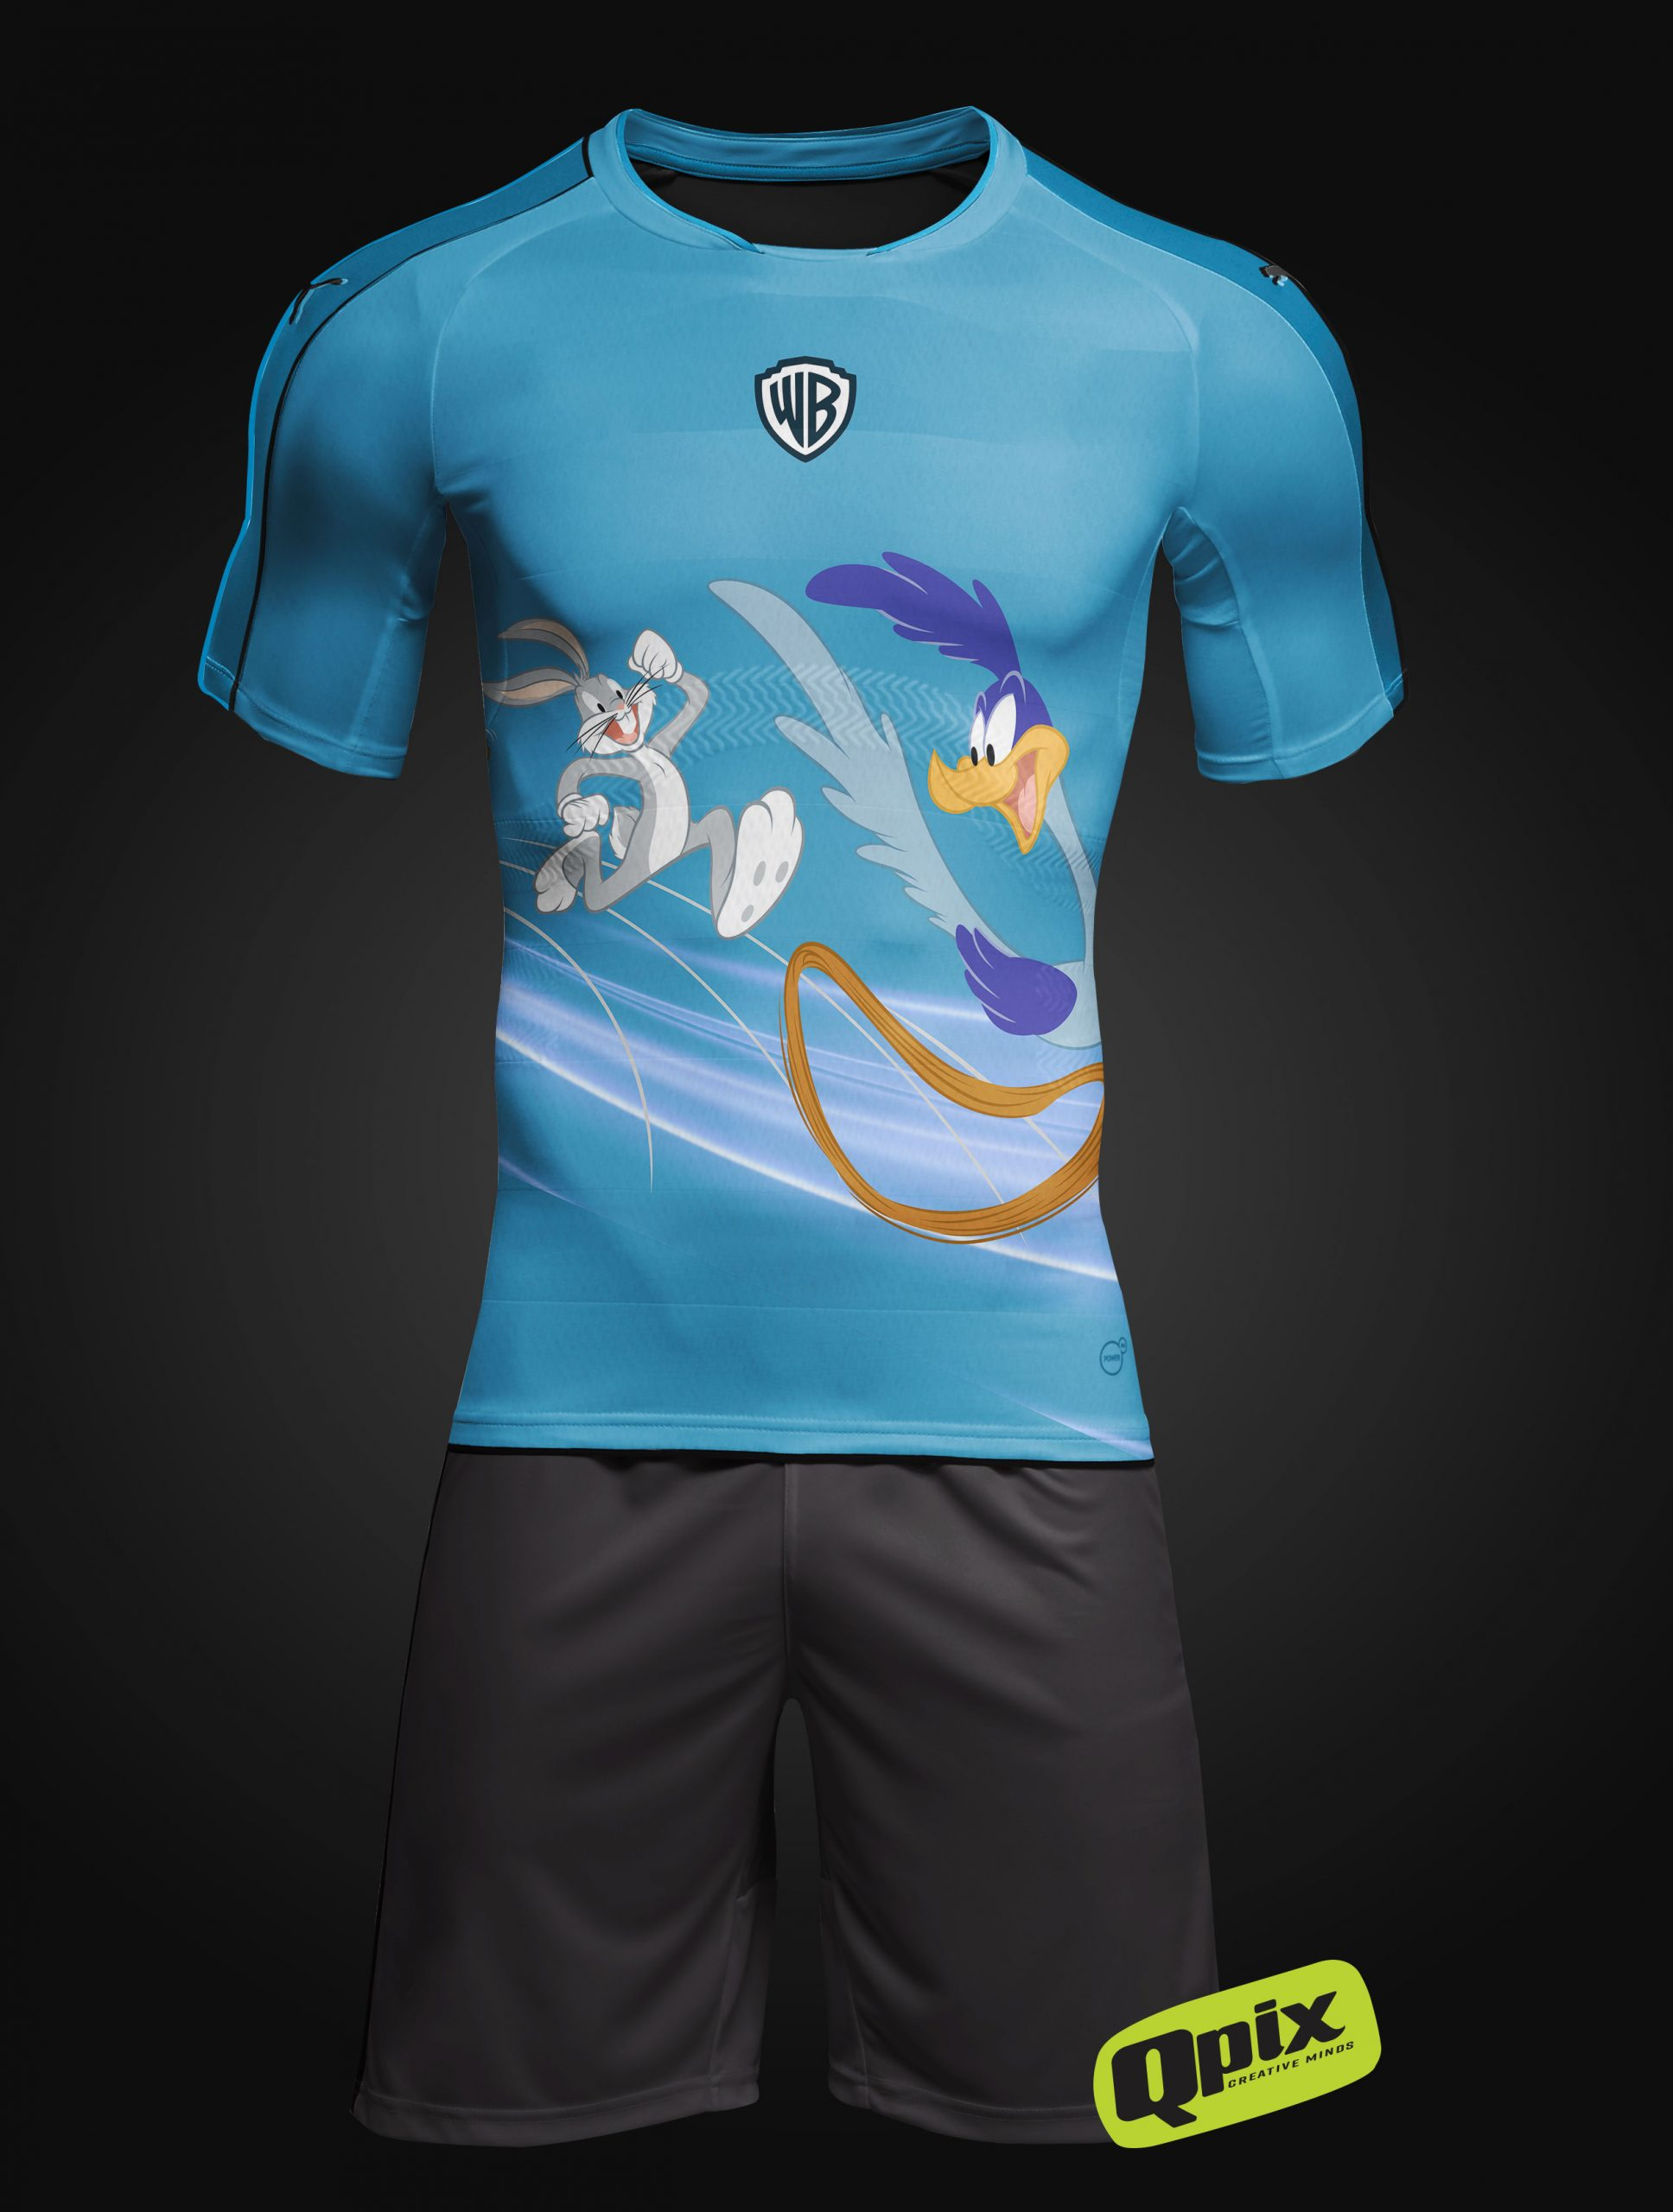 Camiseta de corrida para a equipe WB Runners da Warner Bros.